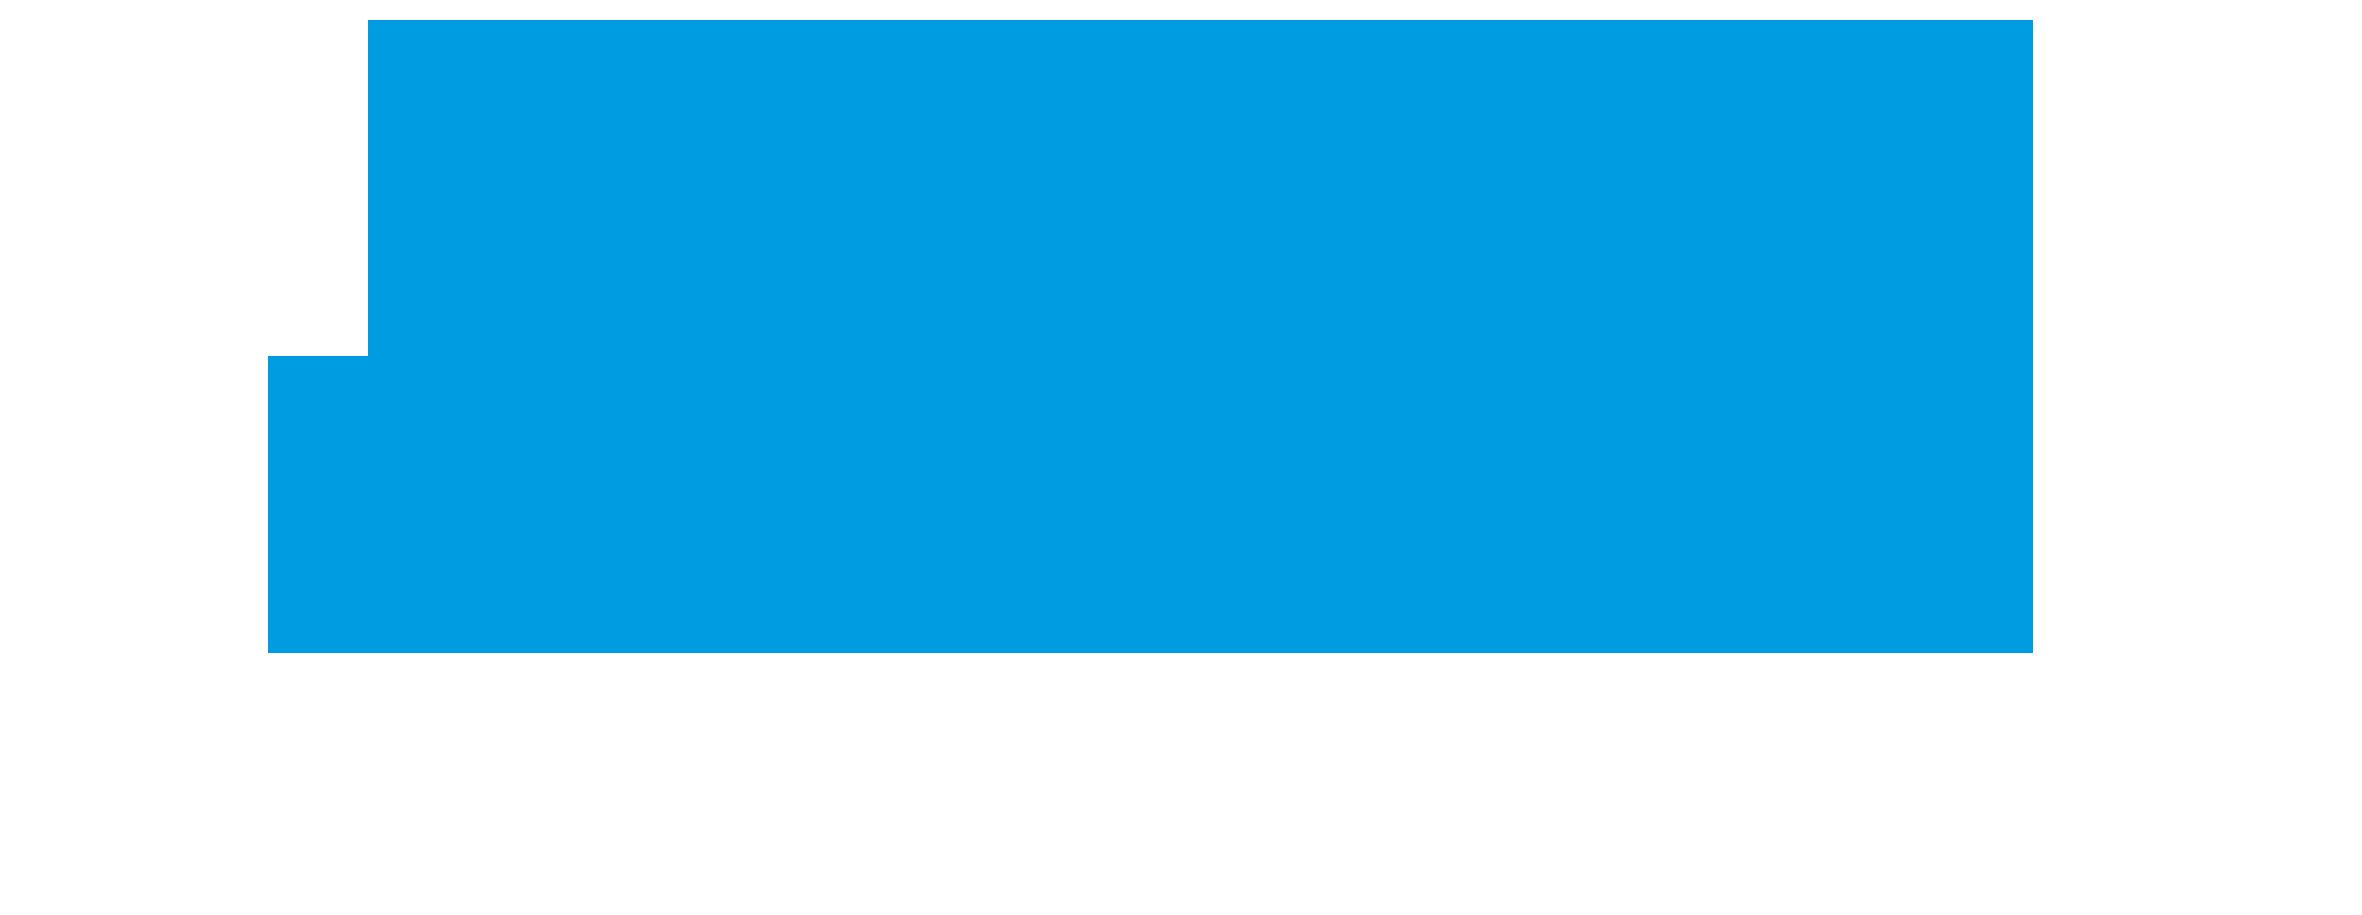 Centro De Negocios Xola Centro De Negocios Xola